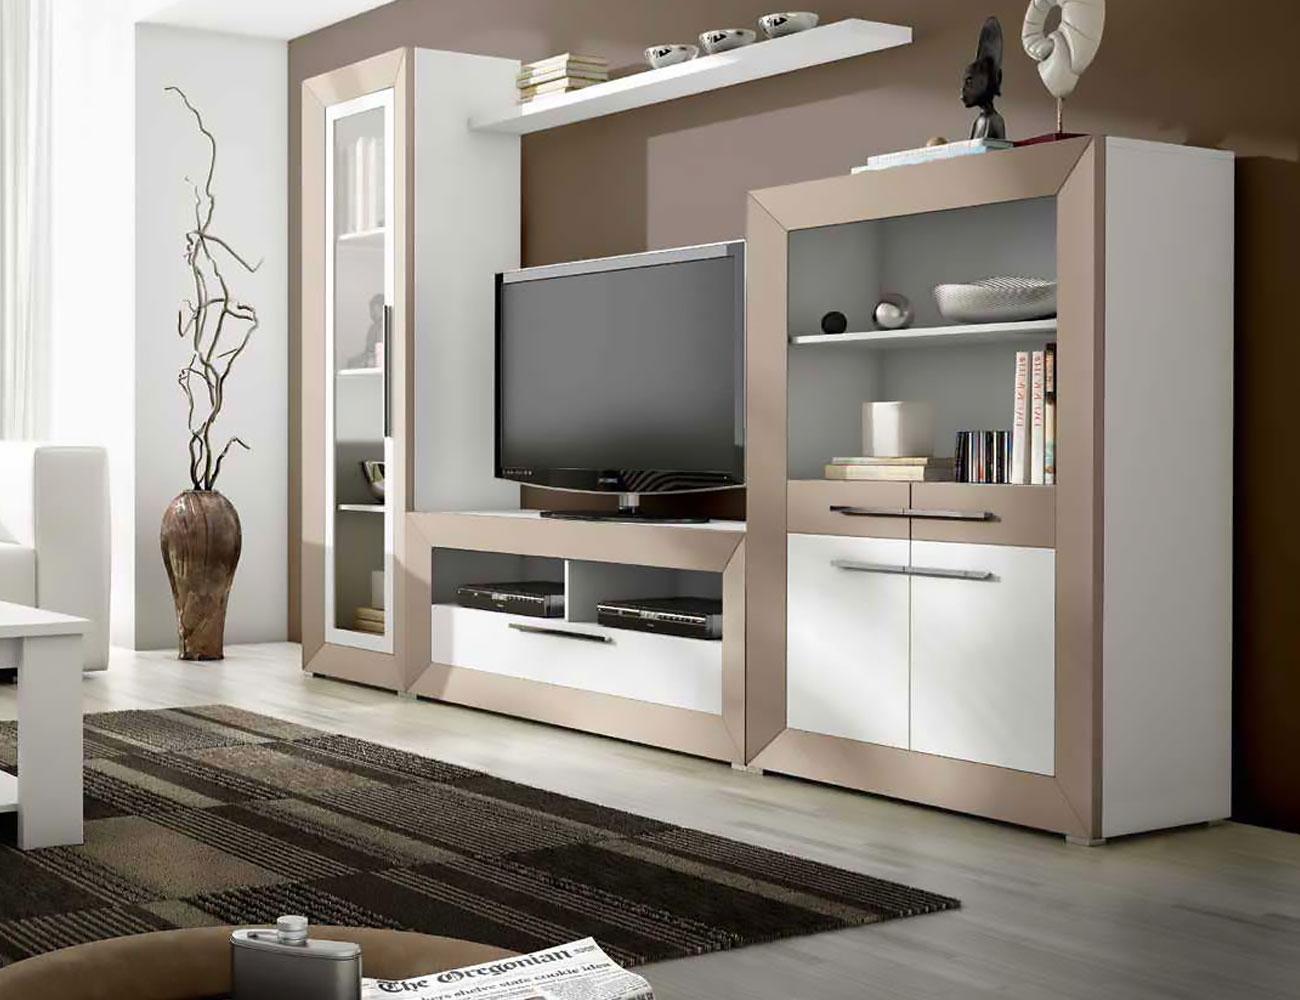 Mueble salon moderno madera dm 01